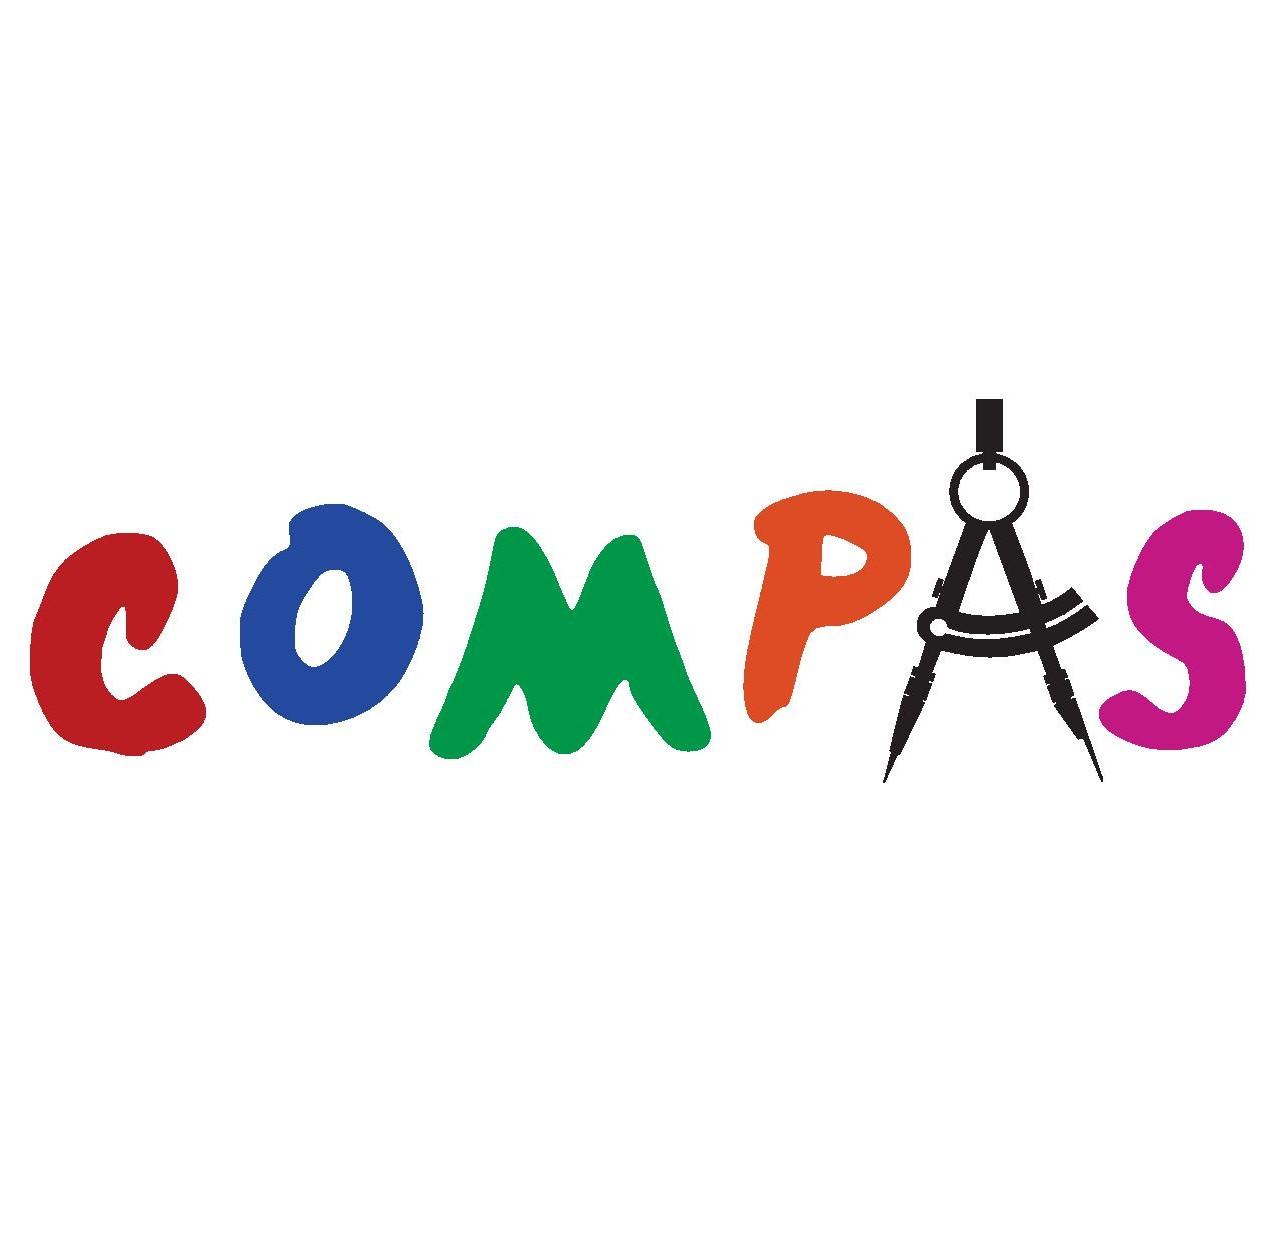 libraria compas zalau value centre